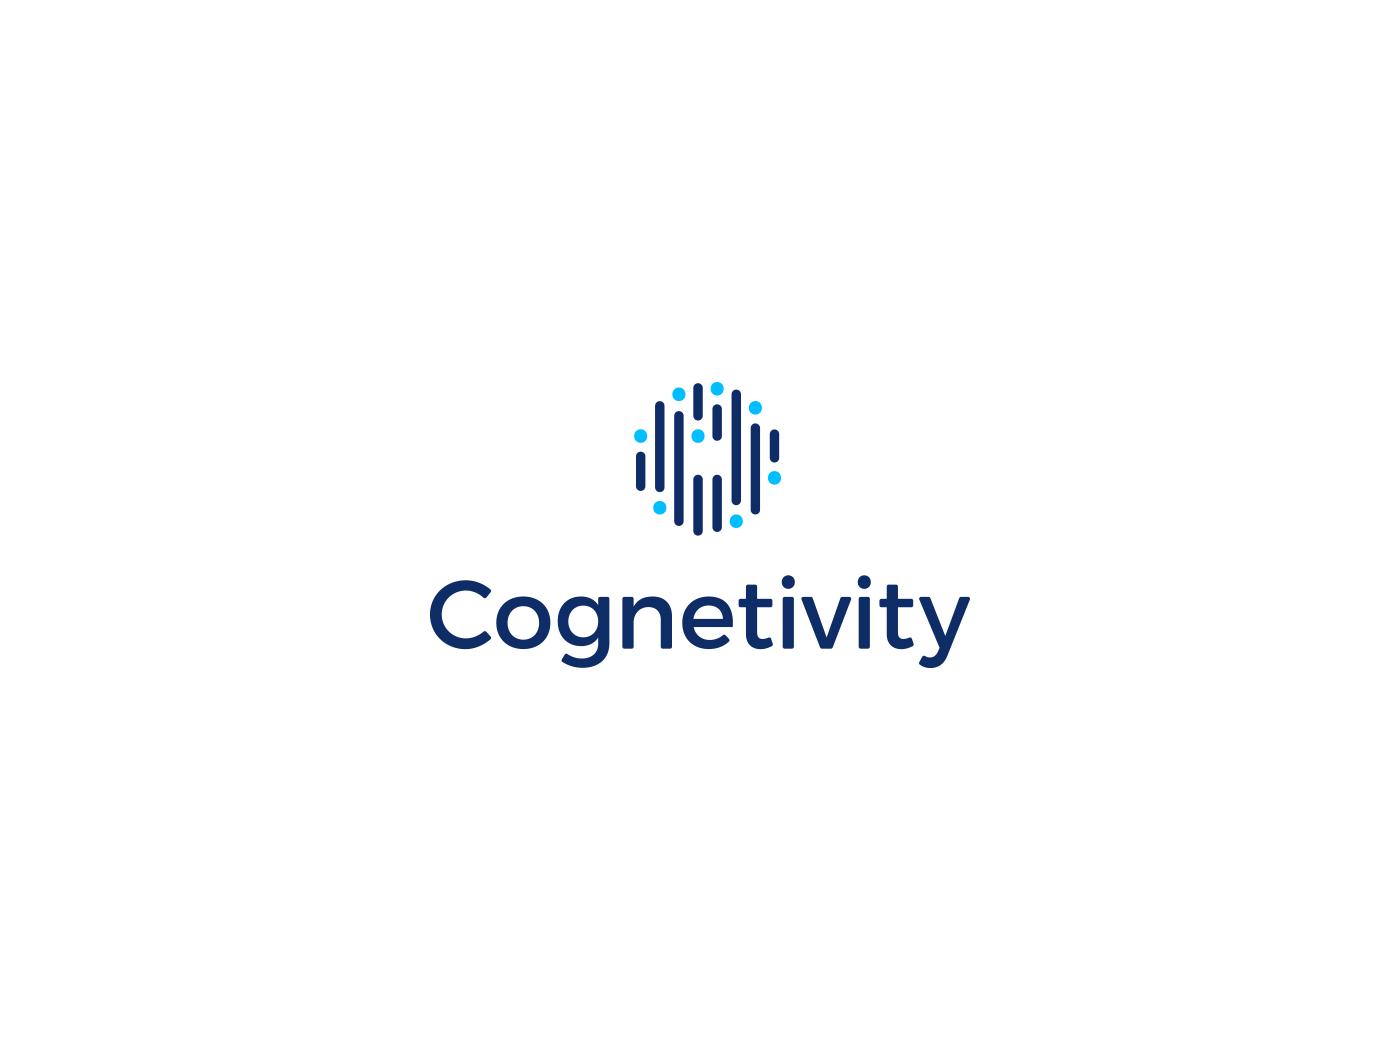 Cognetivity primary logo